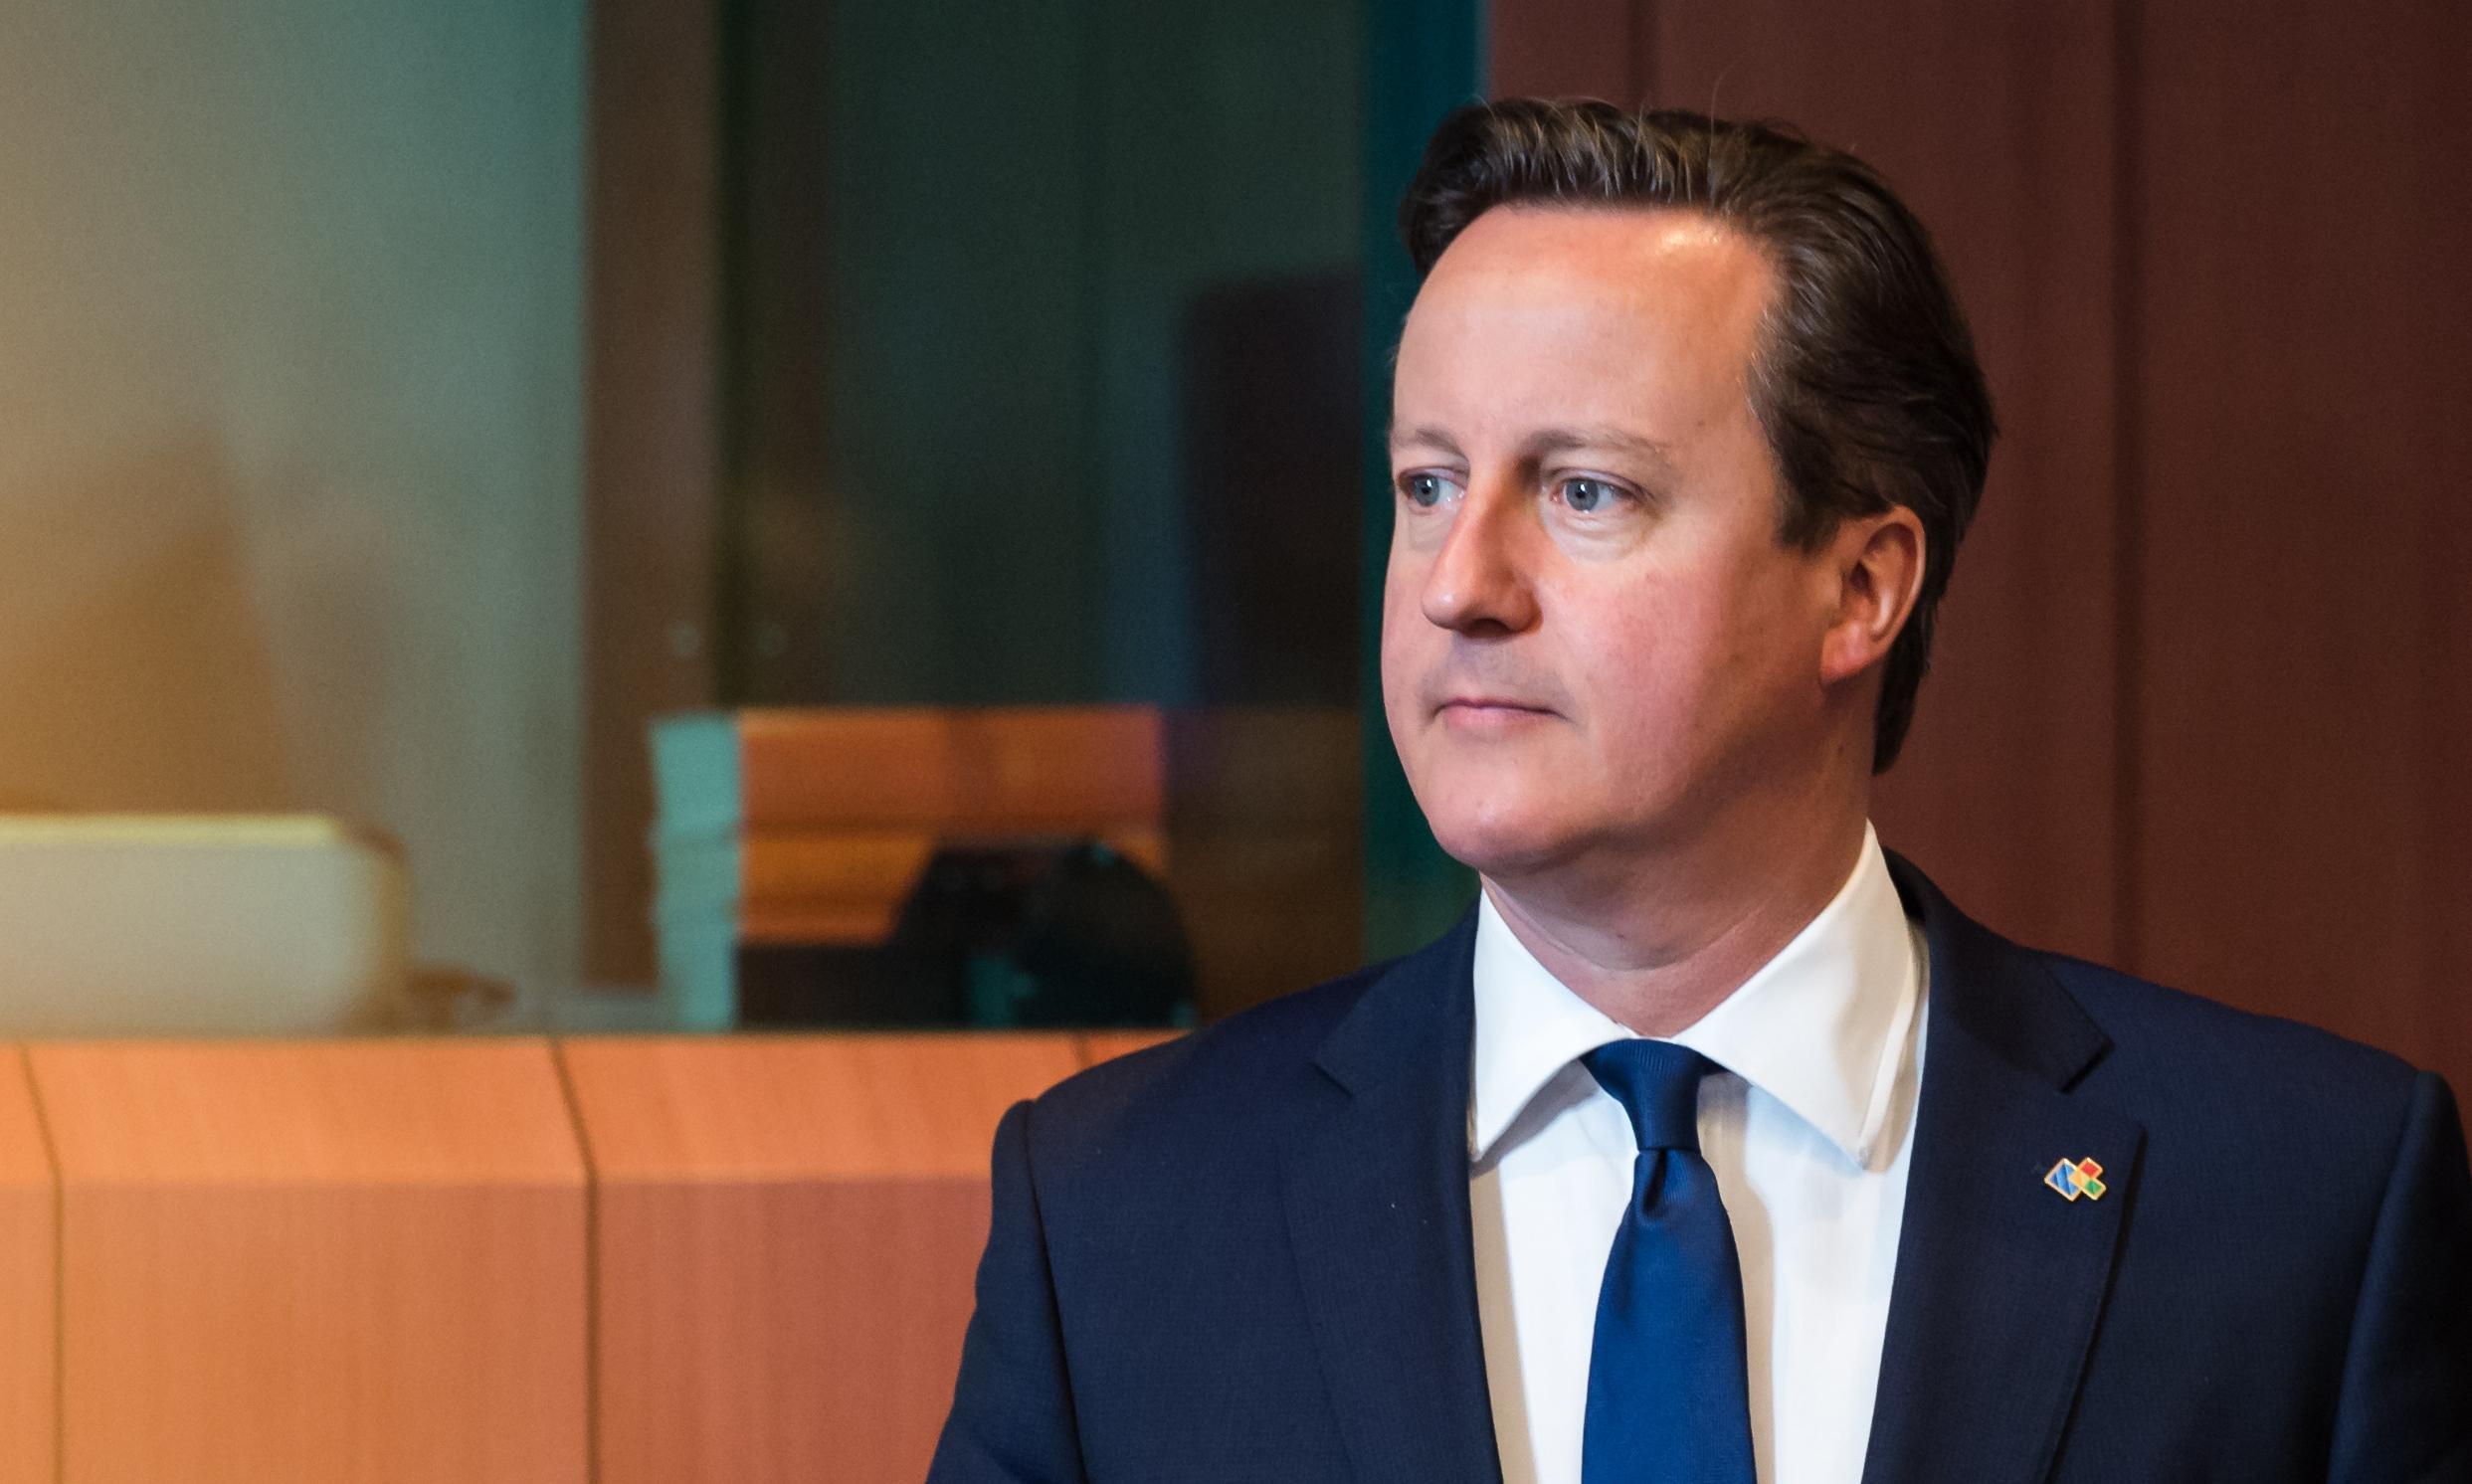 David Cameron: British bill of rights will 'safeguard legacy' of Magna Carta